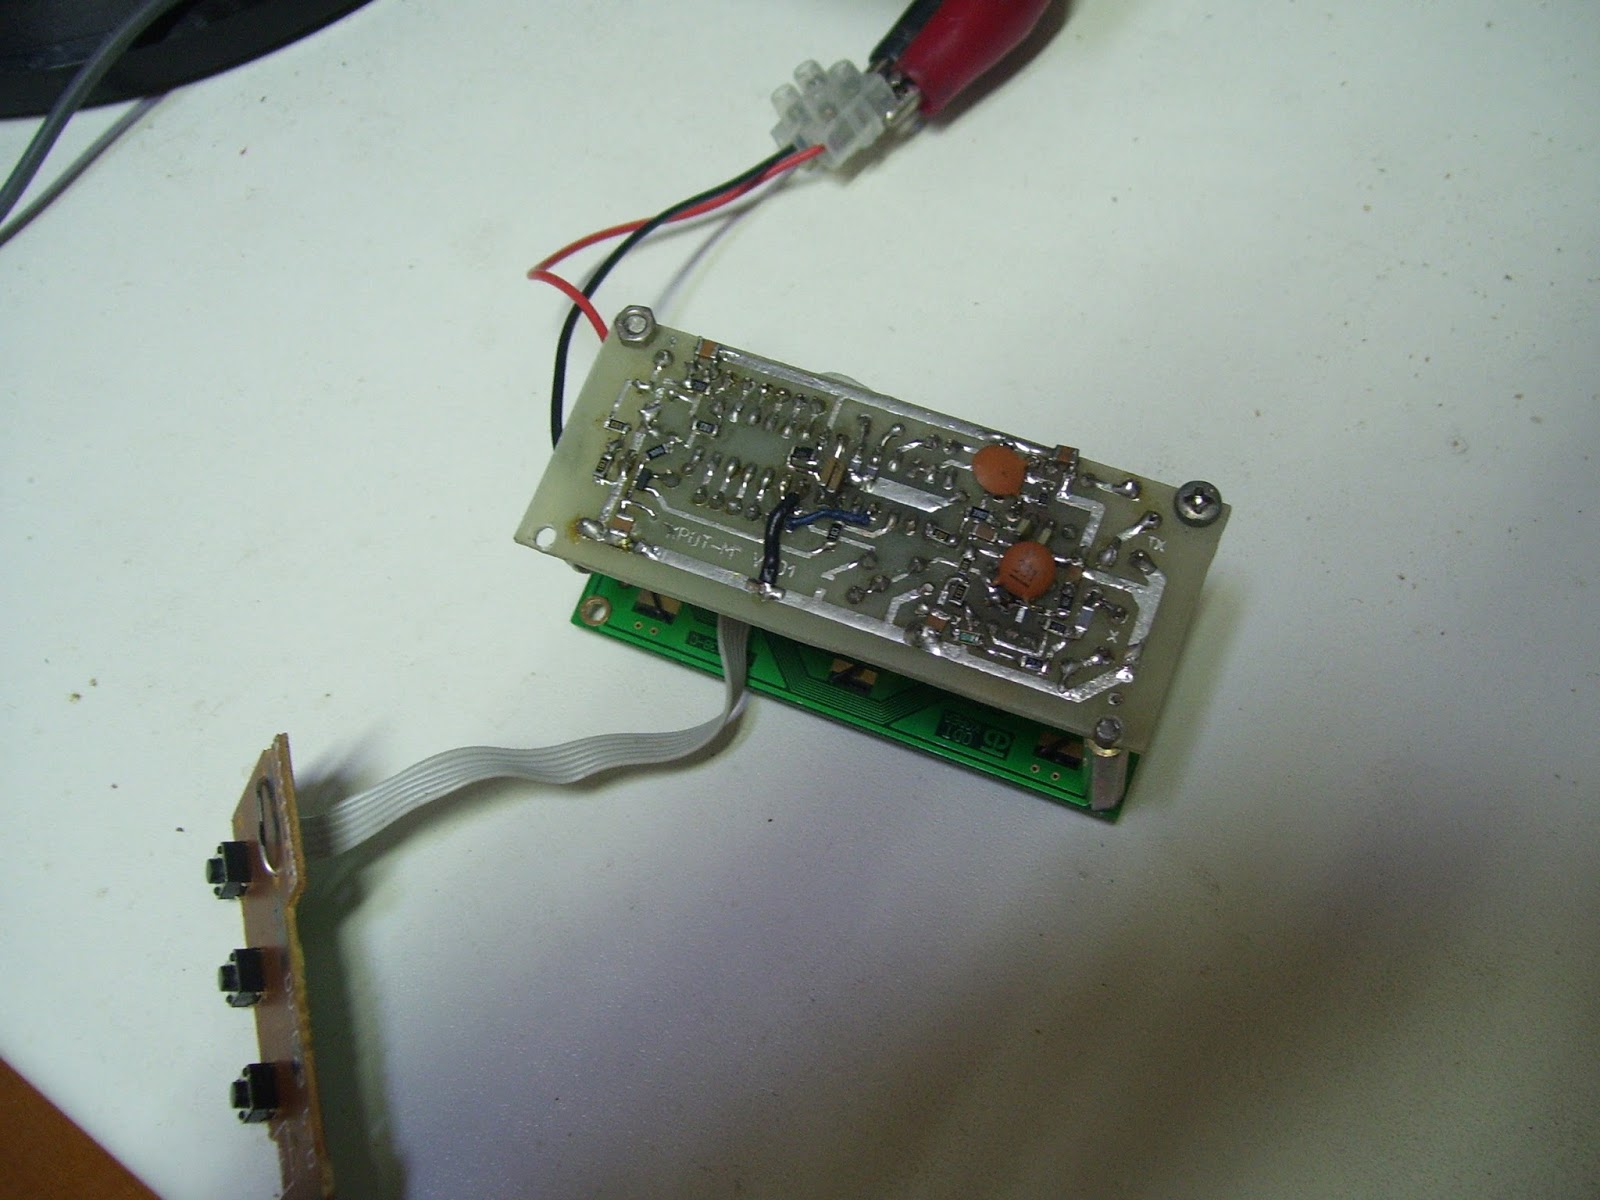 Vlf Metal Detector Schematic Diagram Wiring For Professional Electronic Circuit Photo Gt U03c0 U03c1 U03bf U03c3 U03b5 U03c7 U03c9 U03c2 Rider S Coil Gold